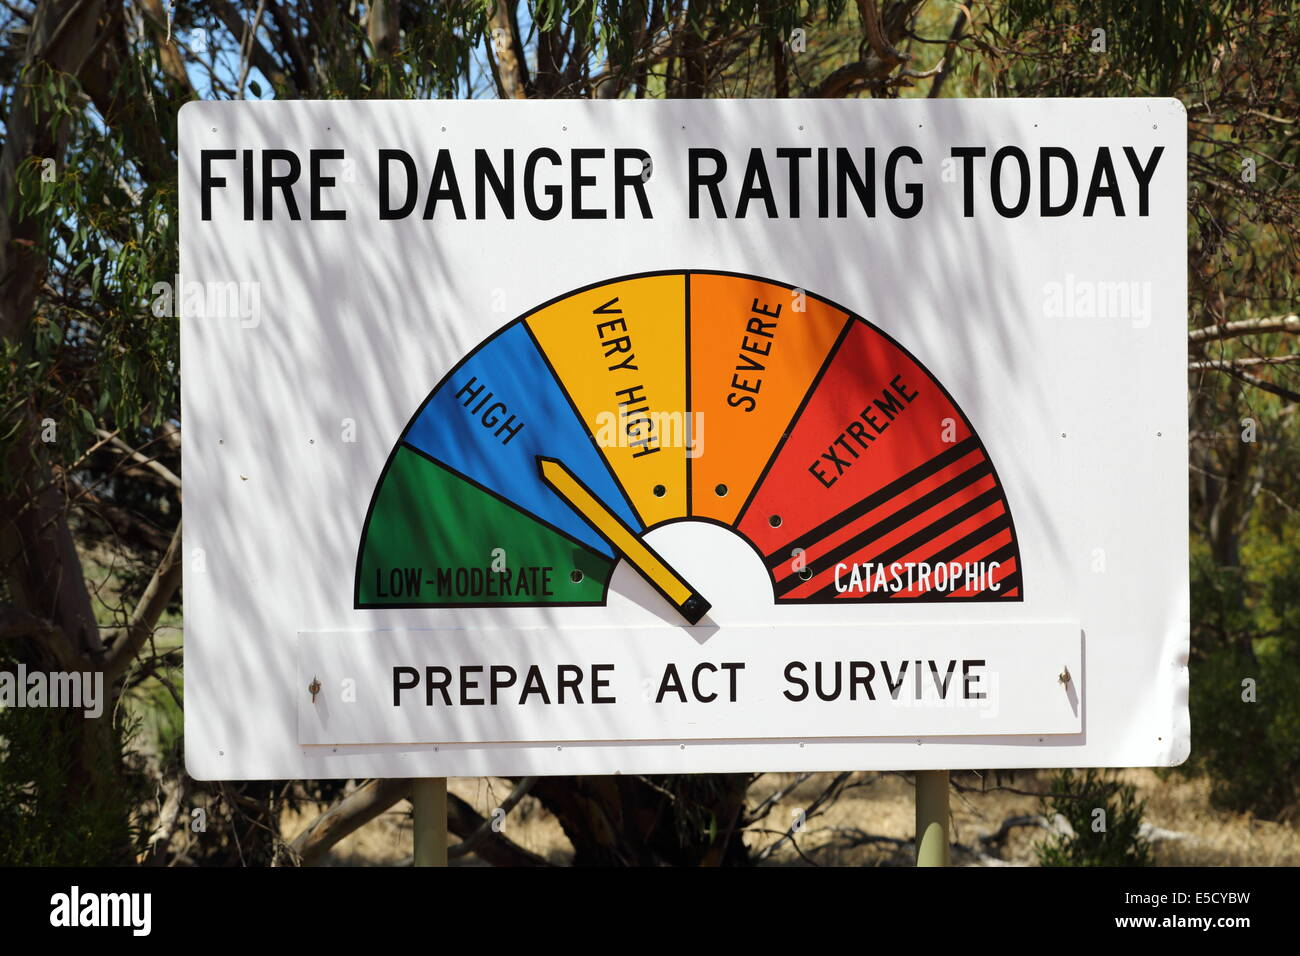 Fire Danger Rating Stock Photos & Fire Danger Rating Stock ...